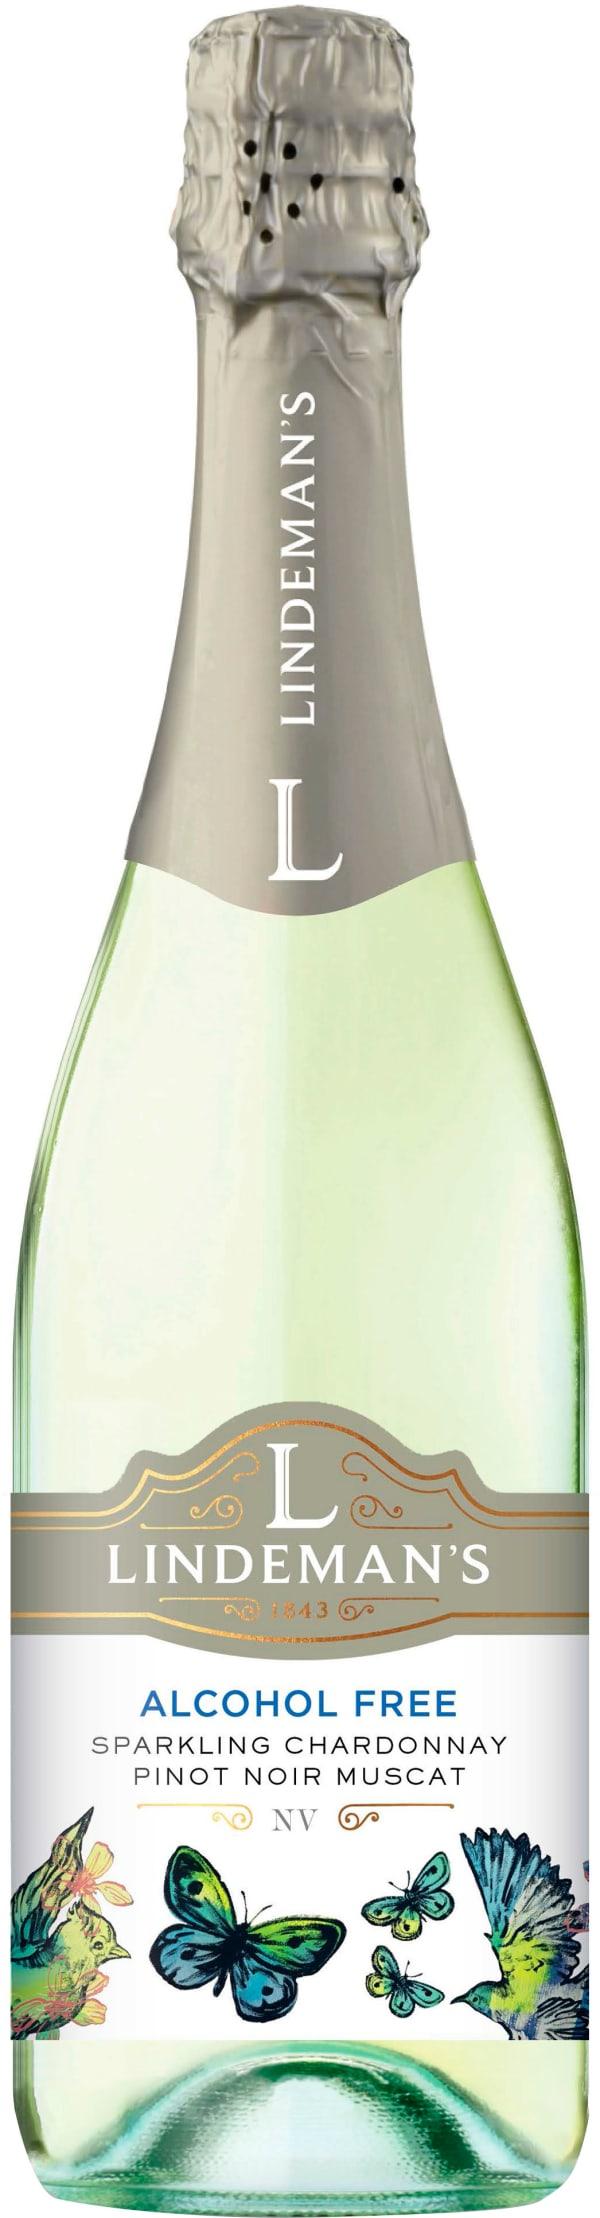 Lindeman's Alcohol Free Sparkling